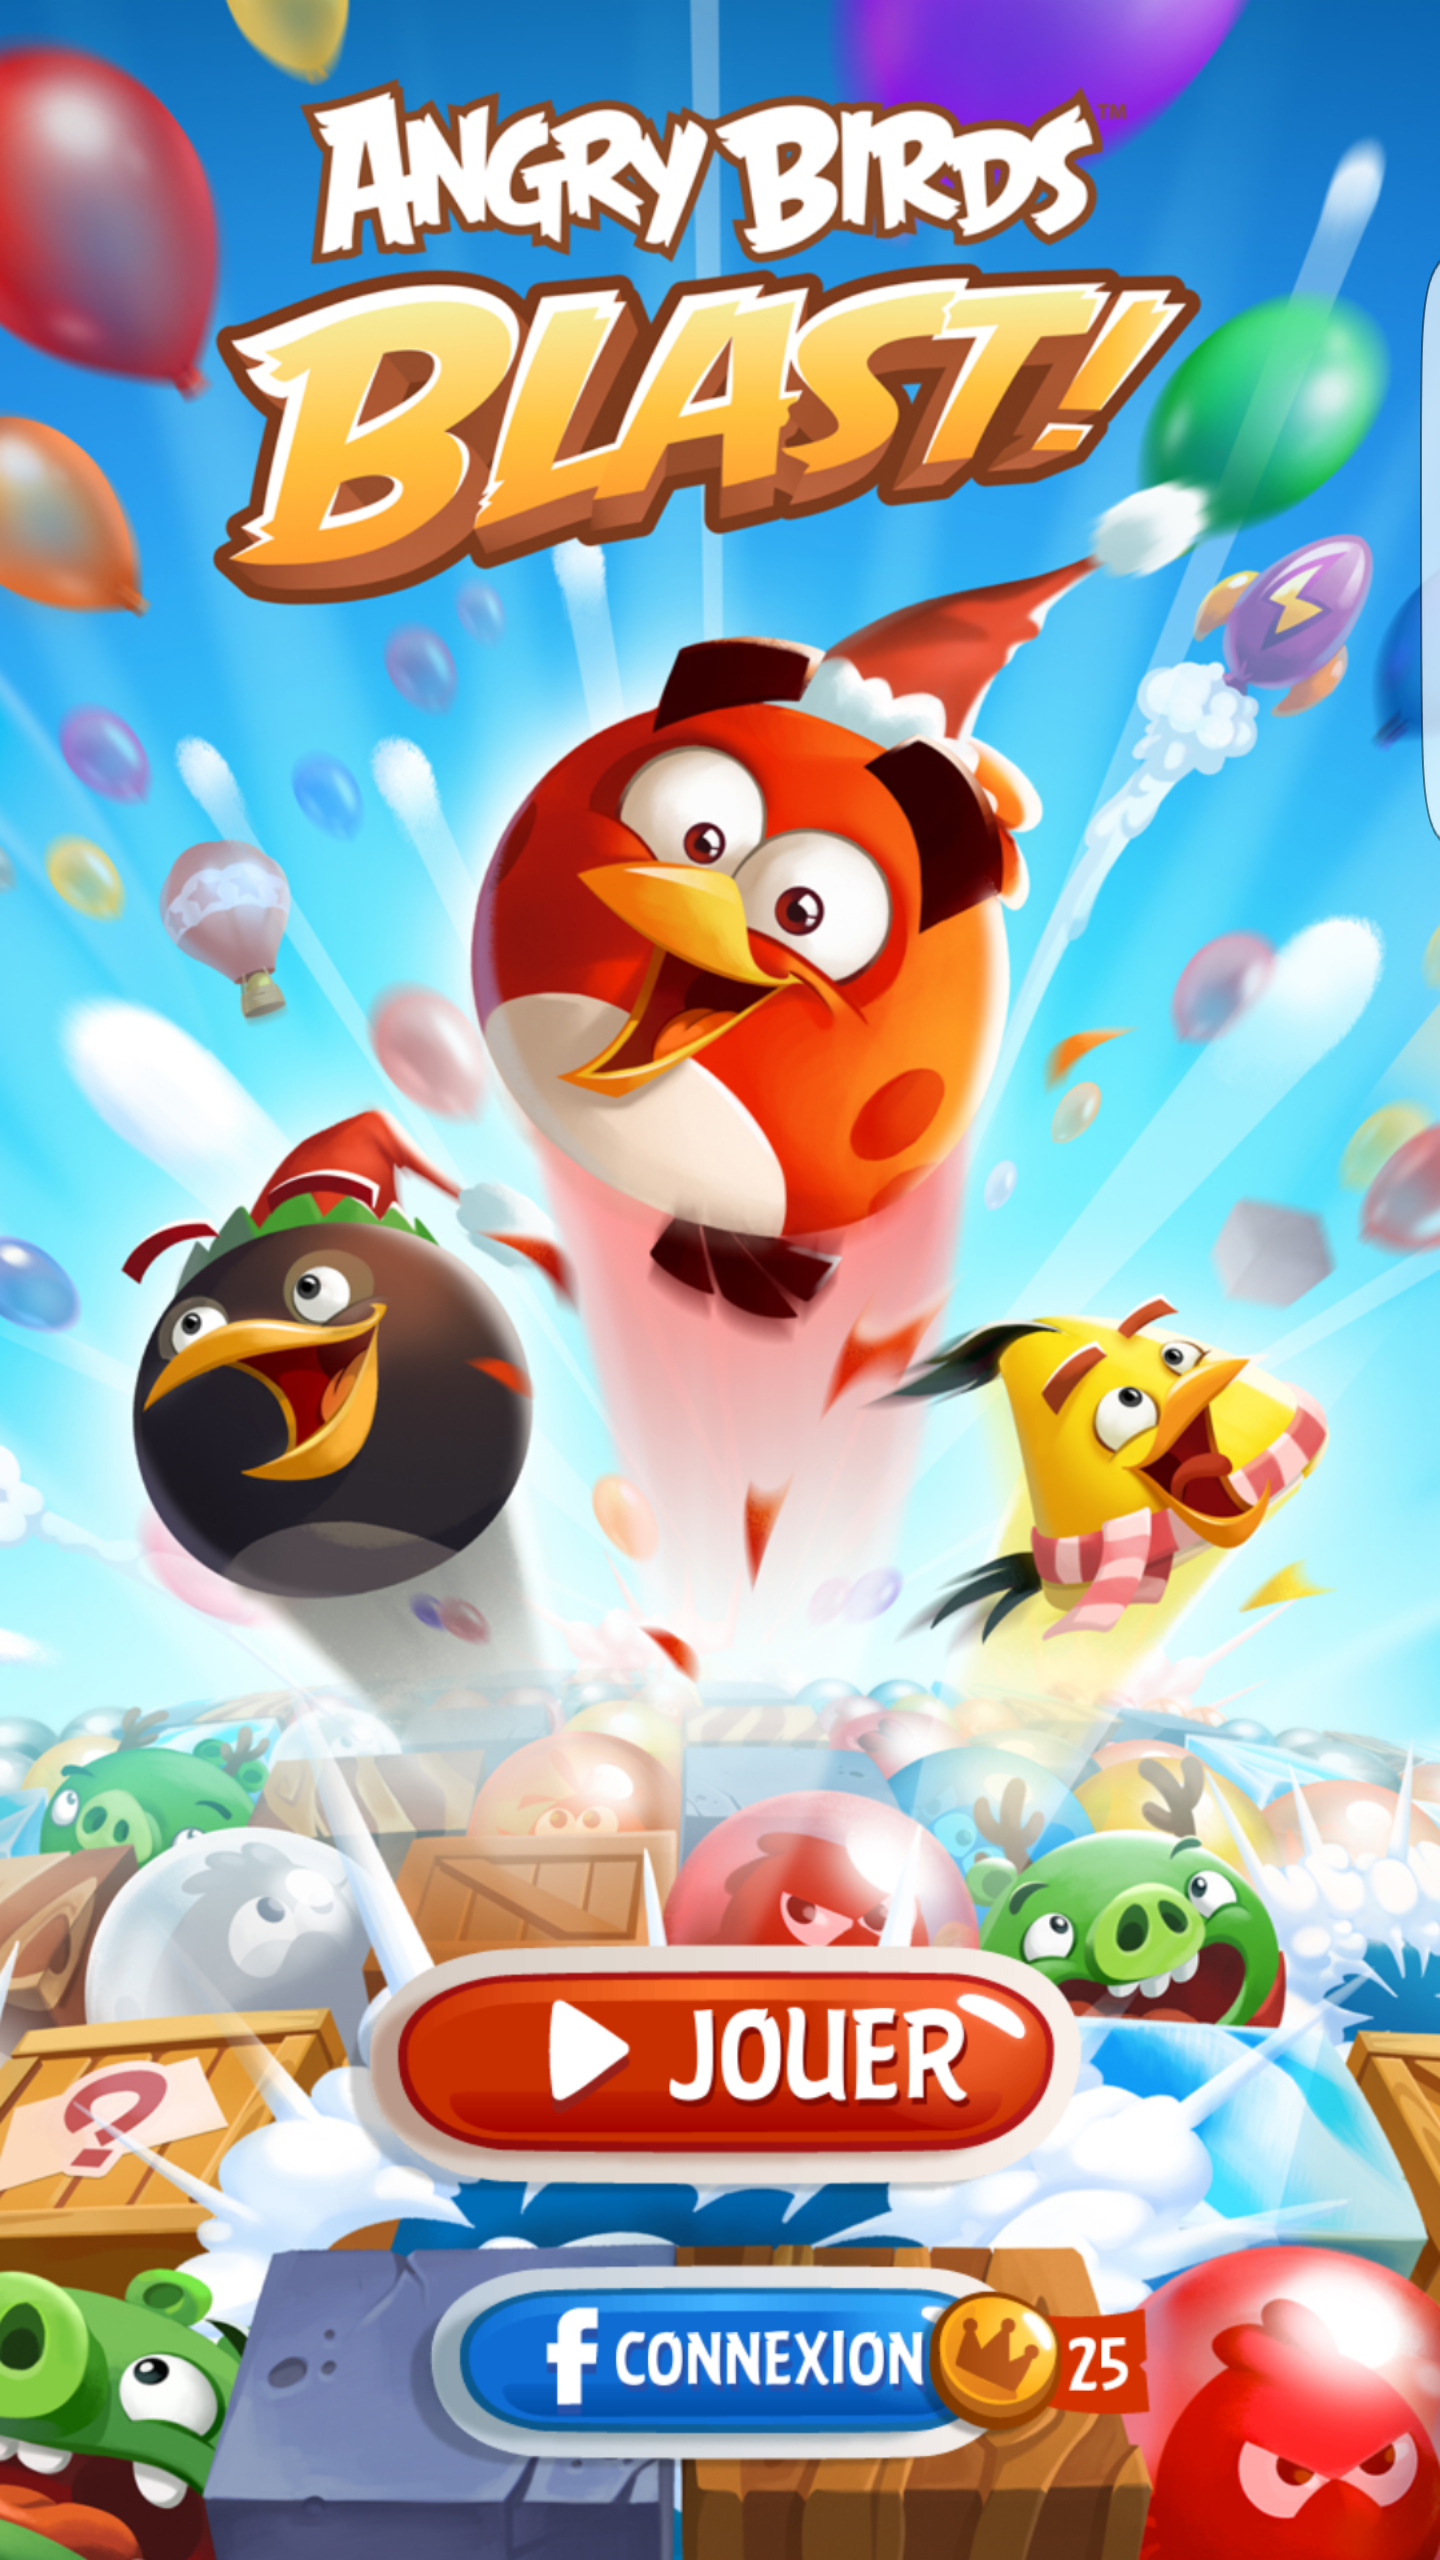 angry-birds-blast-1